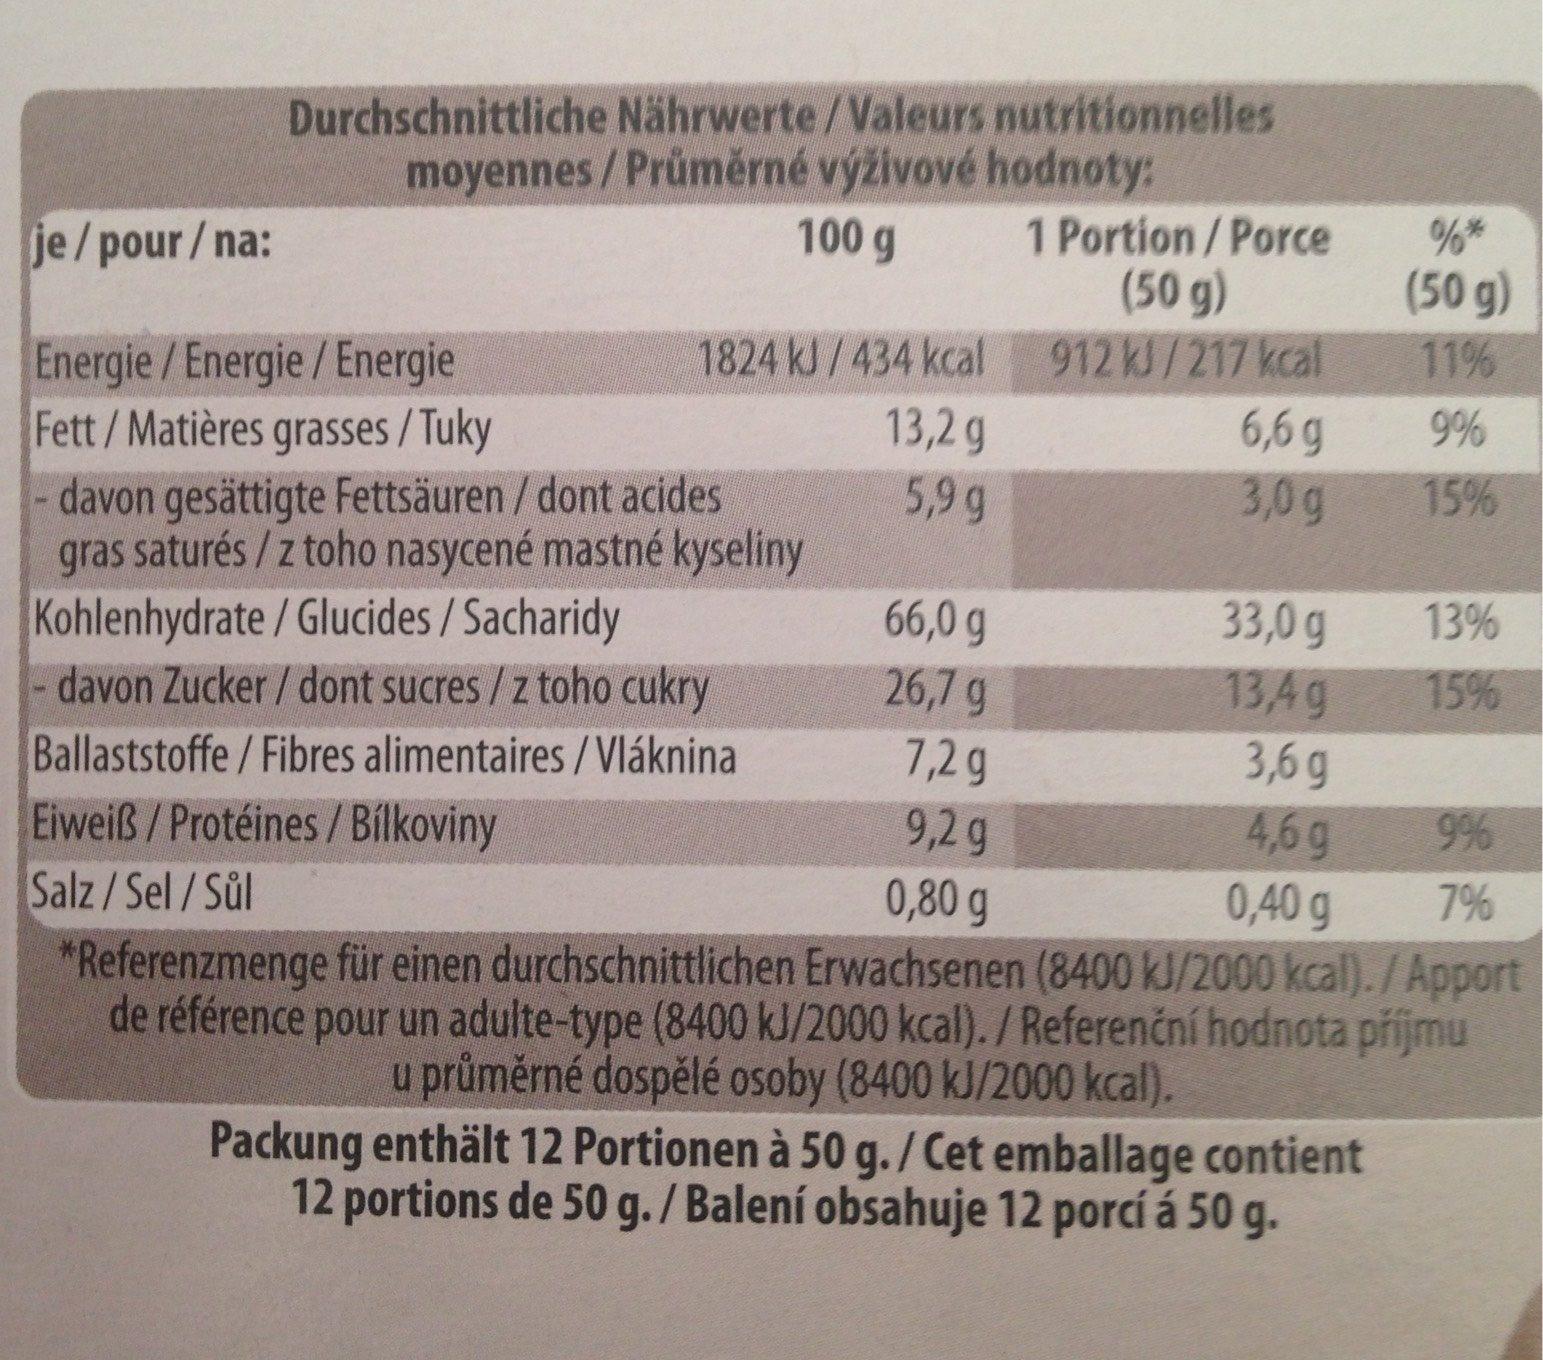 Golden Breakfast Crunchy Schlemmer Müsli, Schoko - Nutrition facts